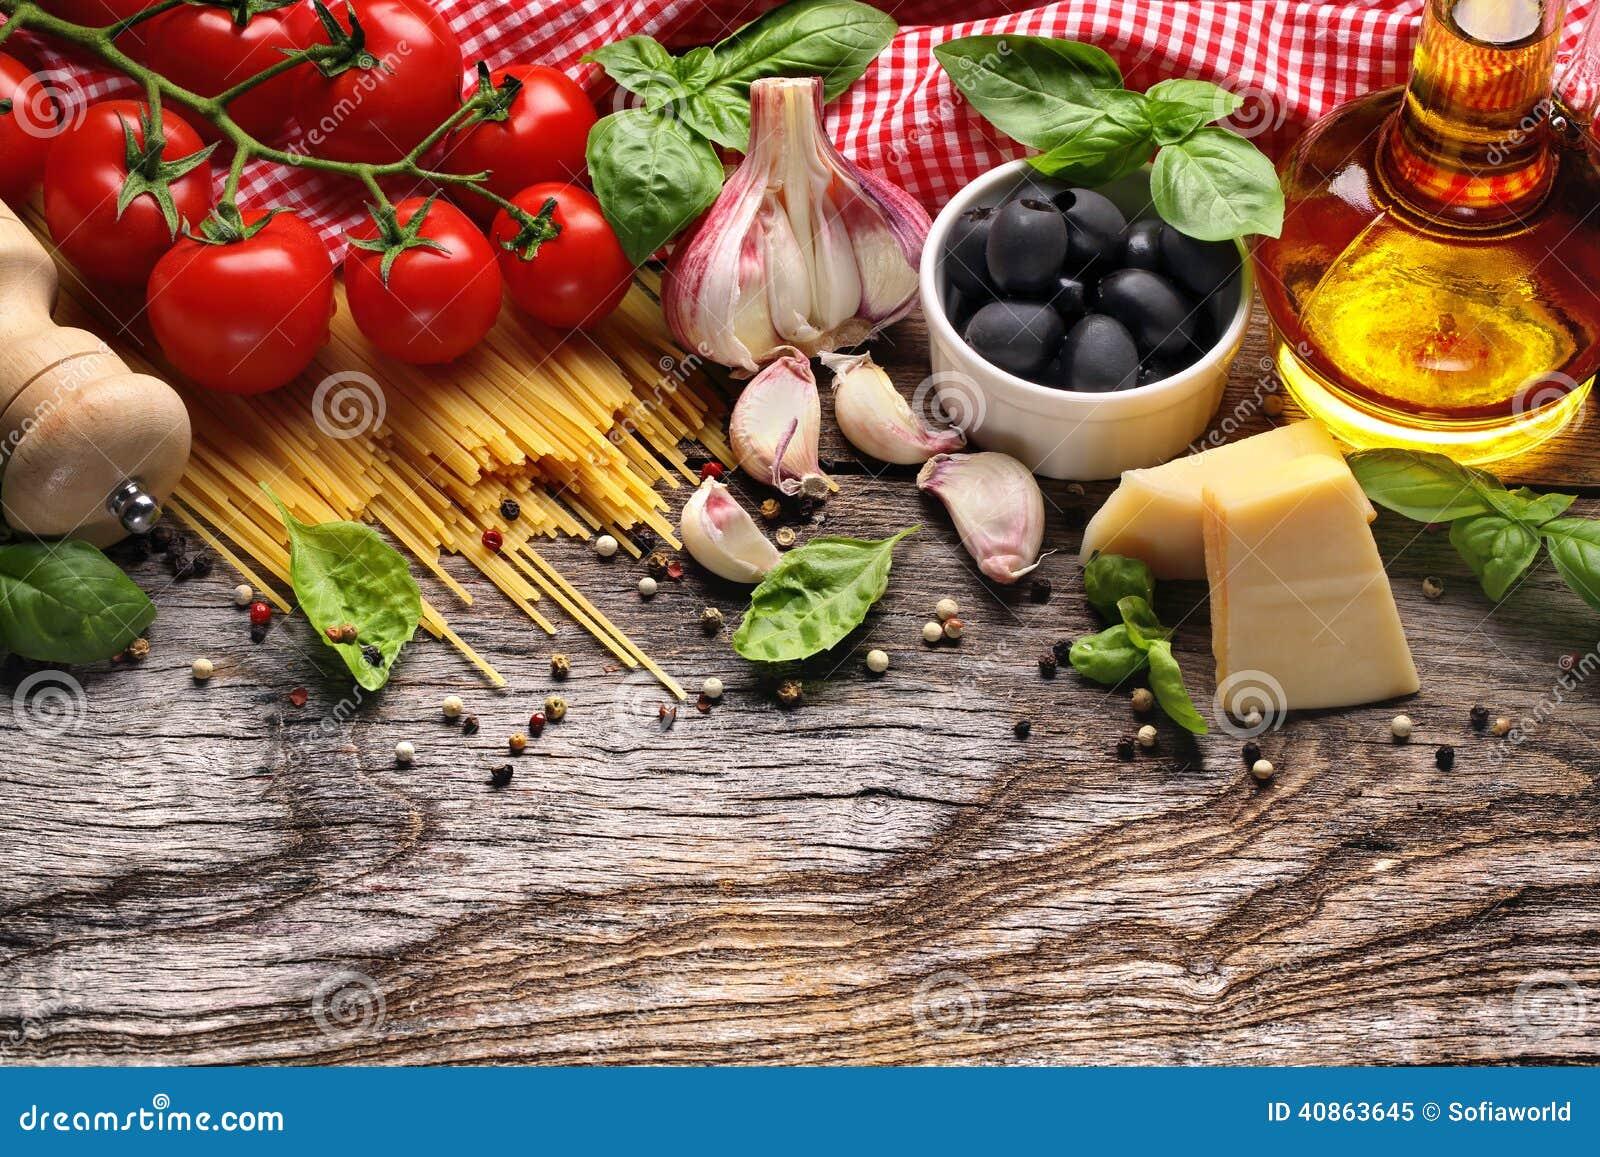 Vegetais, ervas e especiarias para o alimento italiano